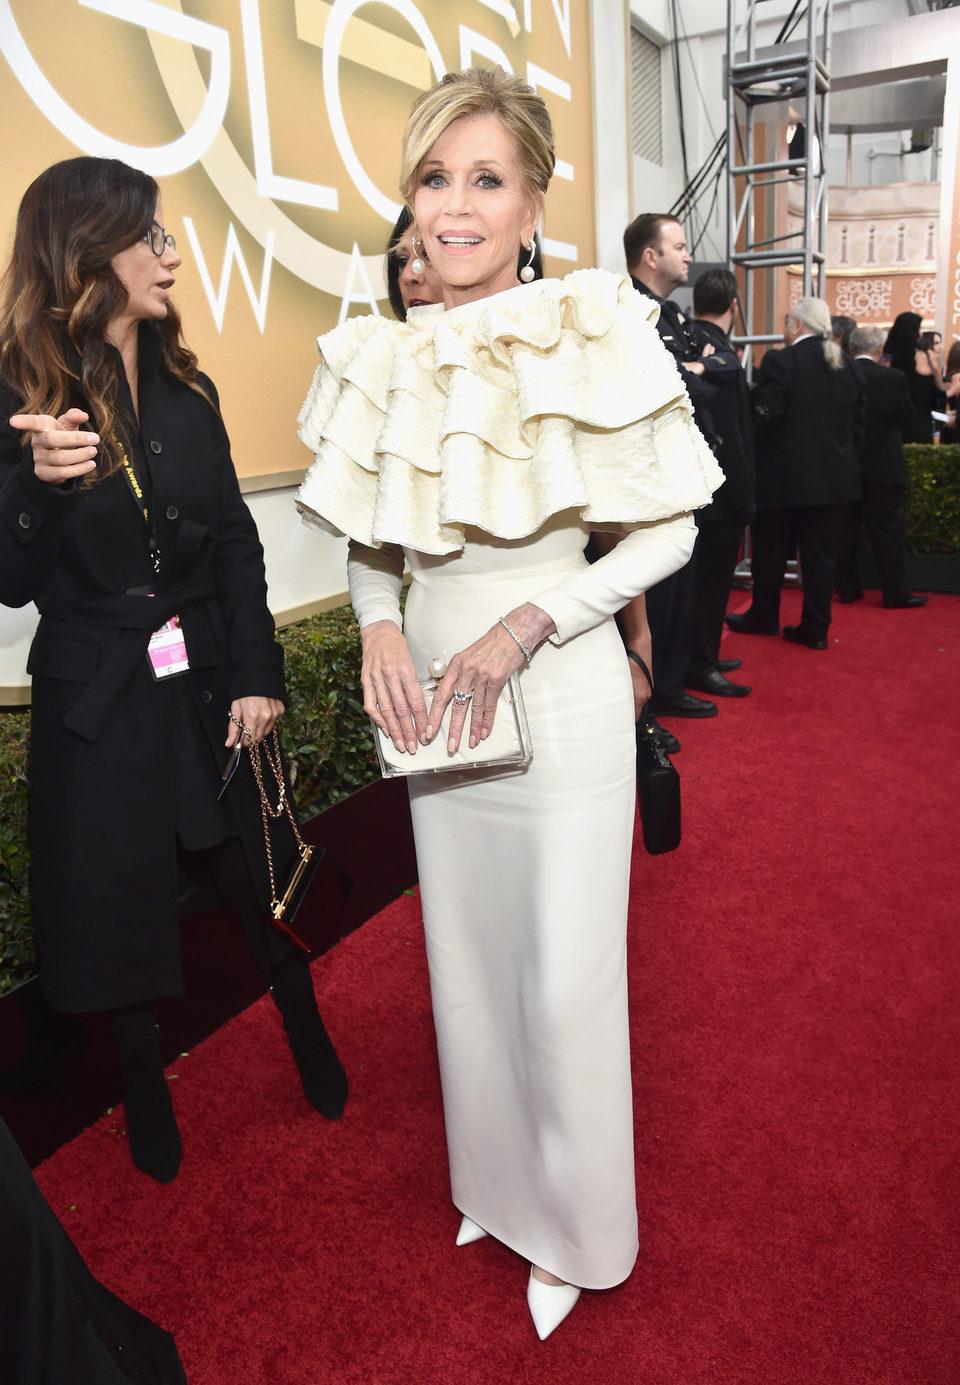 Jane Fonda in the 2016 Golden Globes red carpet